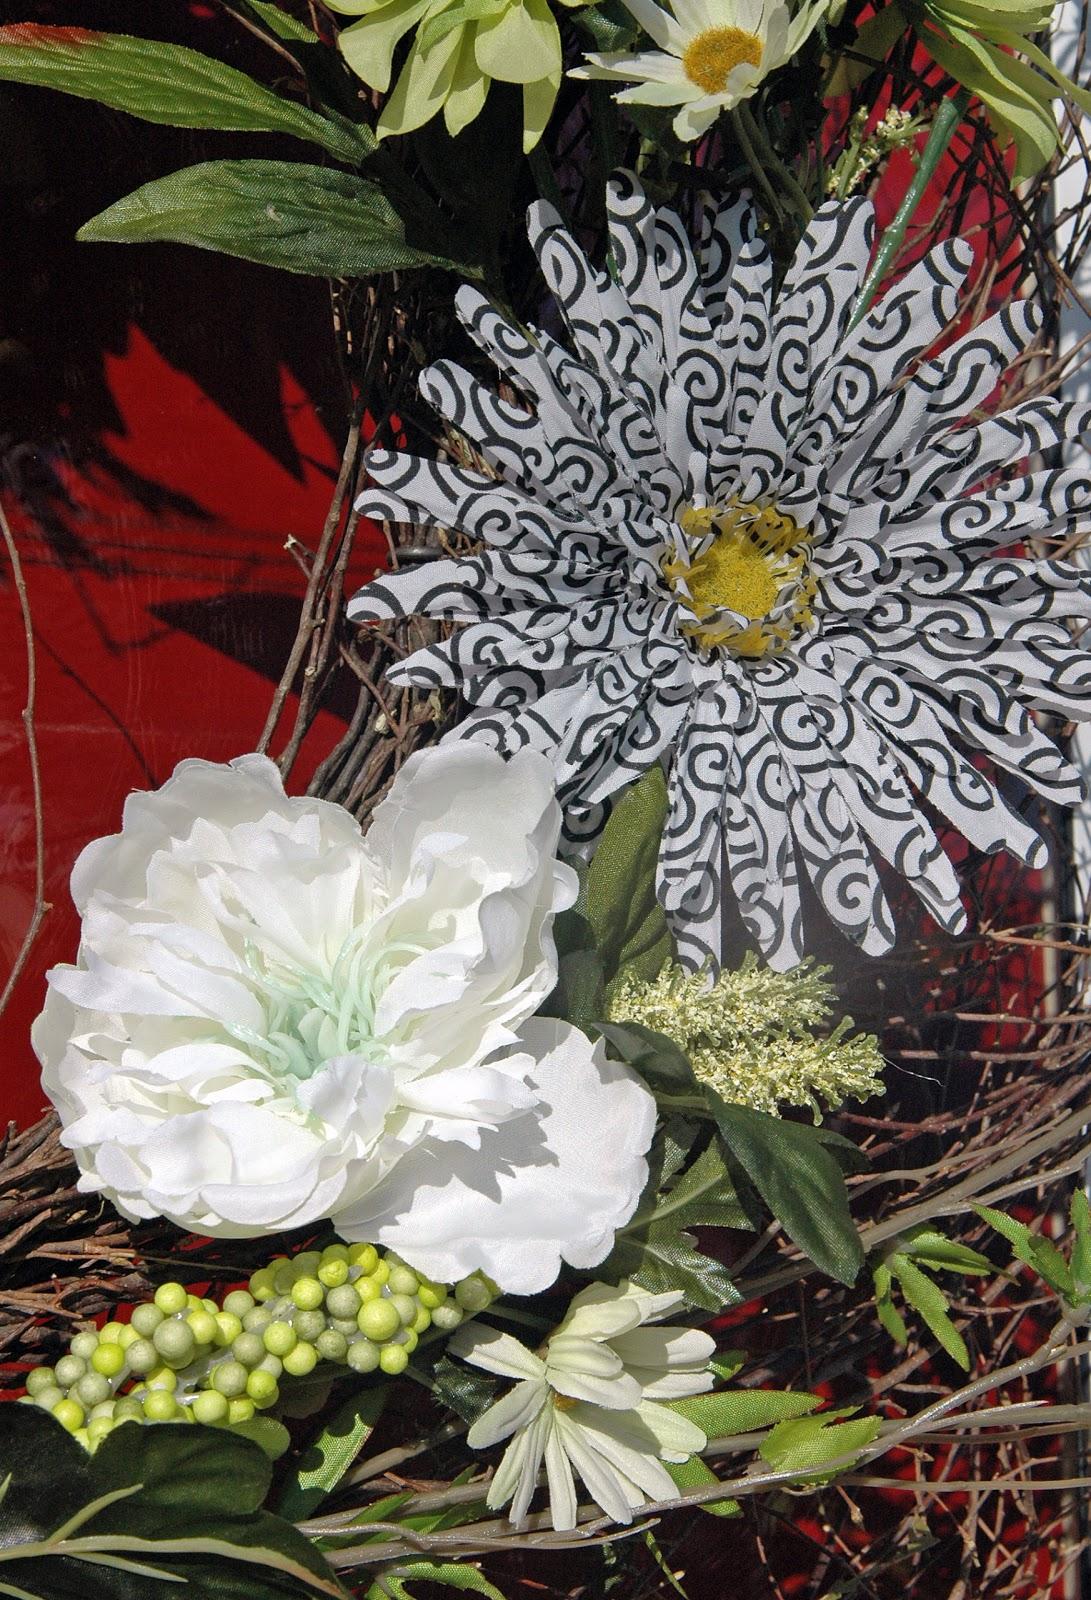 Deborah Jeans Dandelion House And Garden Bring On Spring Silk